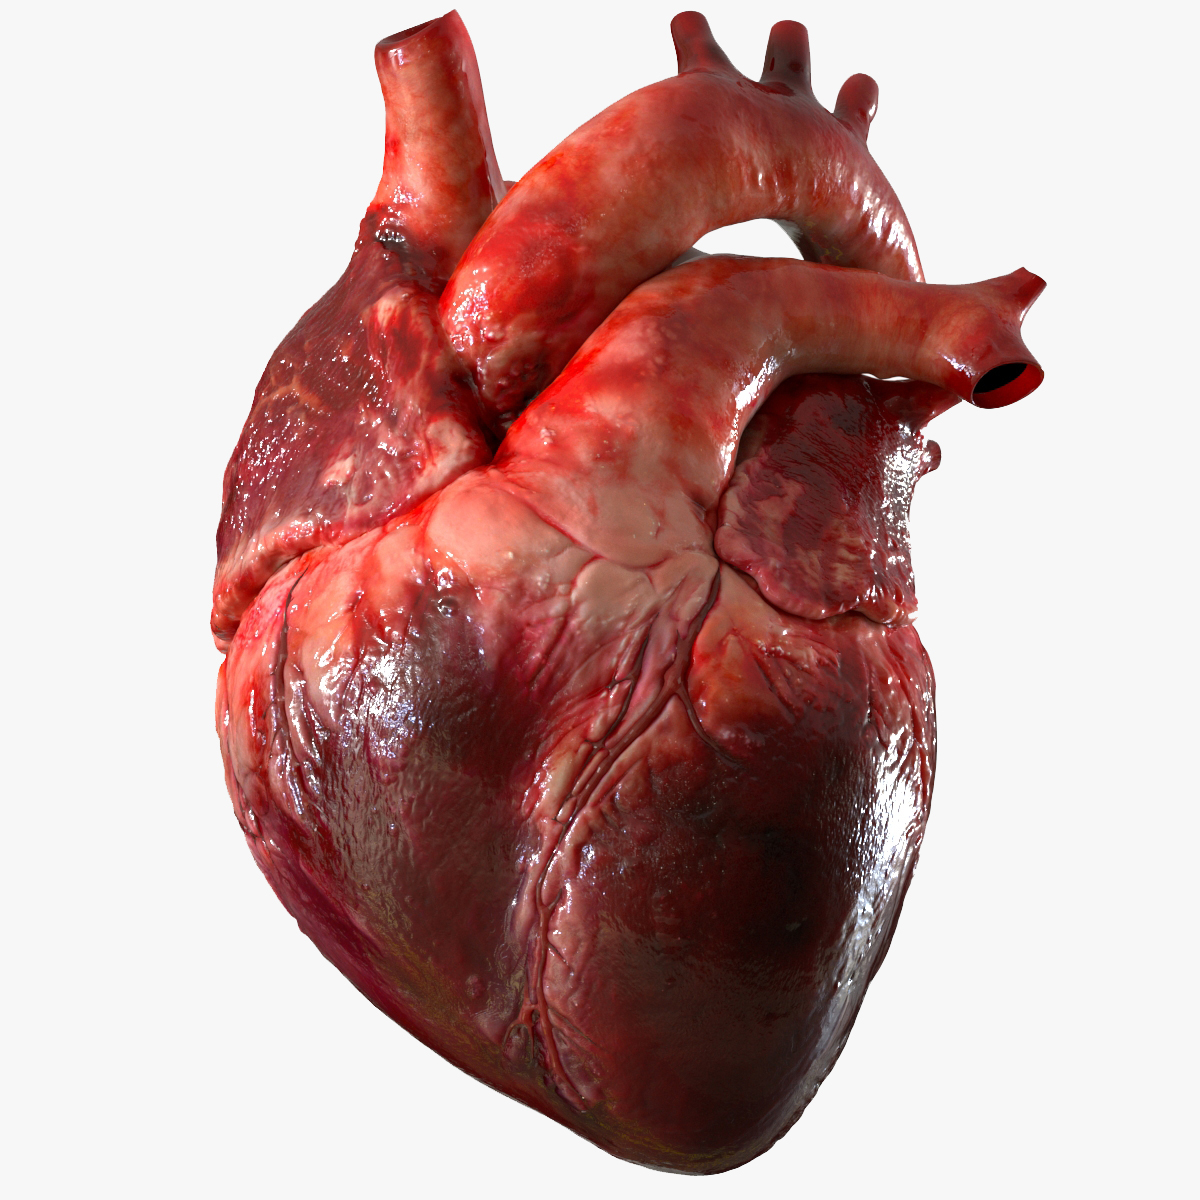 3D human heart anatomy model